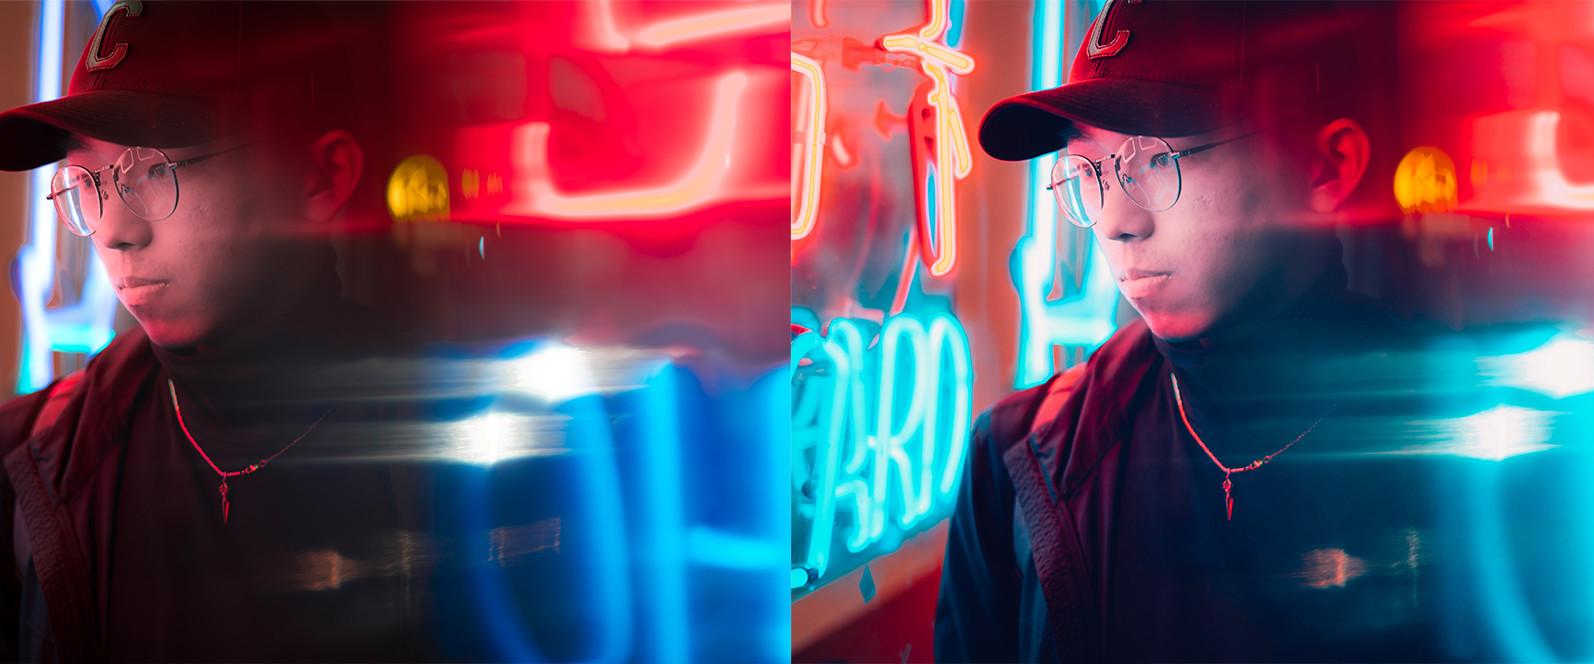 BUNDLE /// 08_Lightroom Collection // 71 x Desktop and Mobile Presets - 13 Neon City 1 -